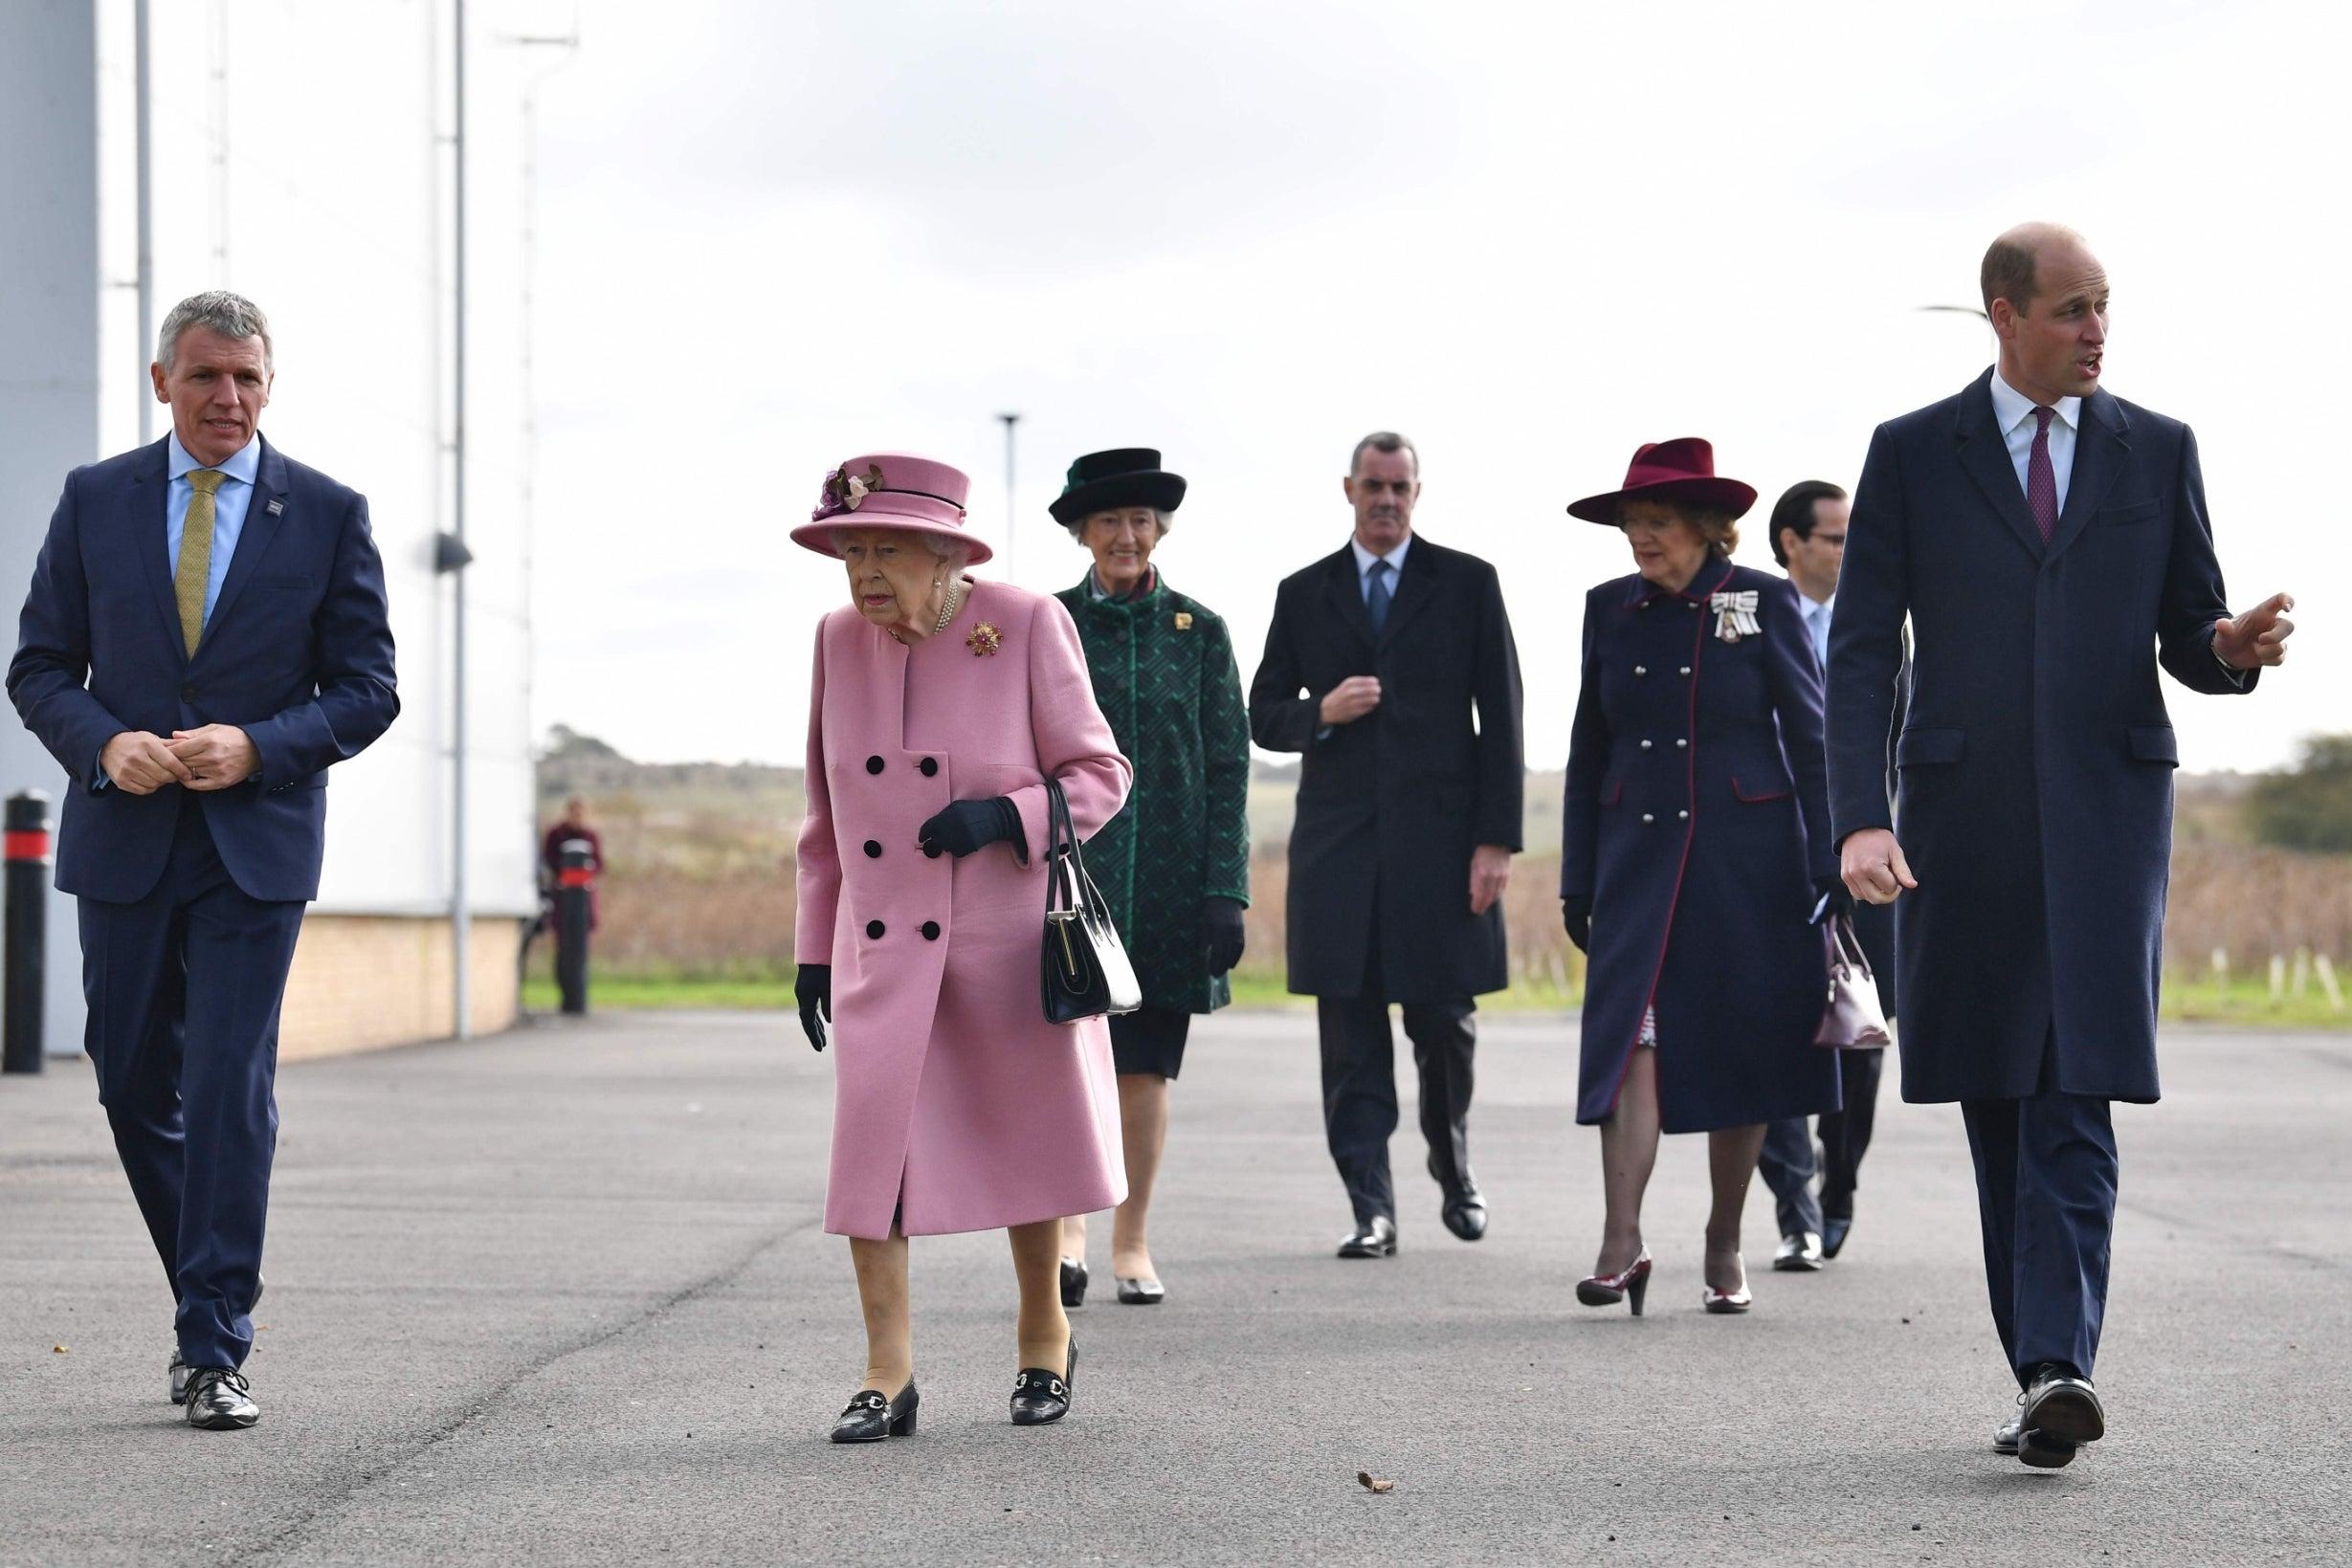 Королева Елизавета II появилась на публике впервые с начала пандемии